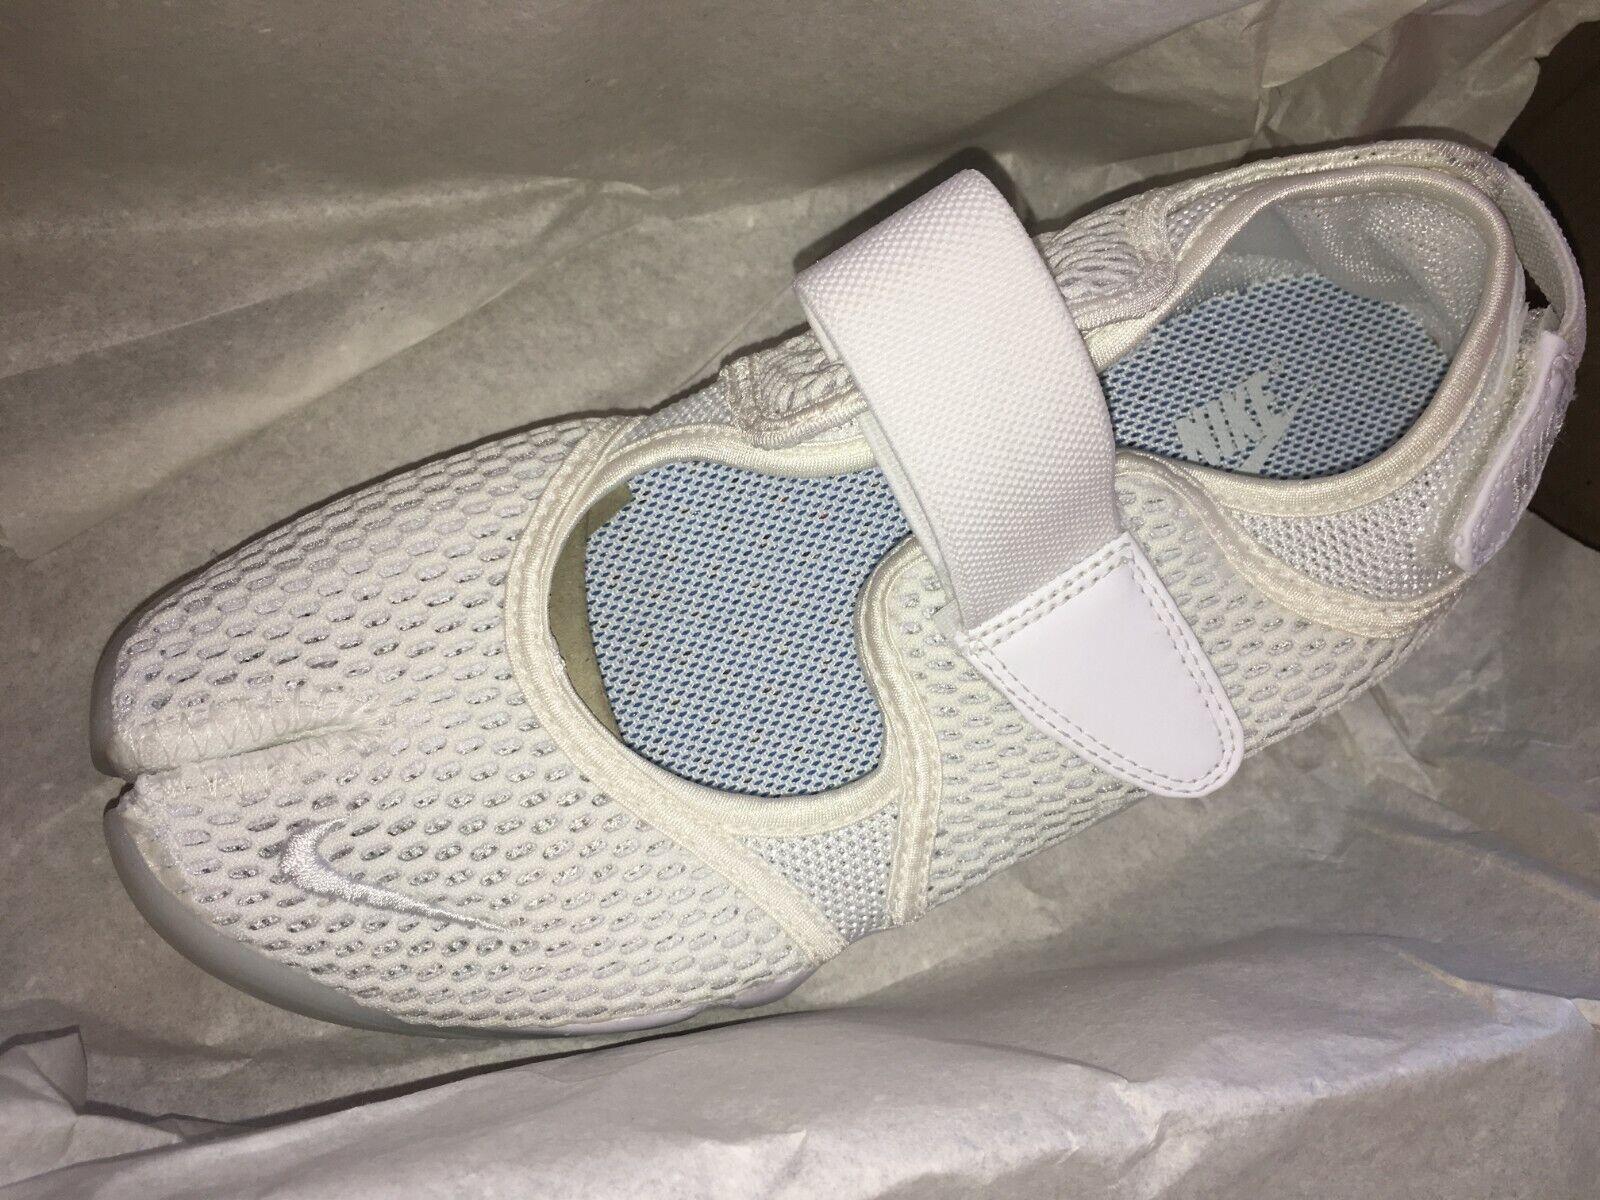 Nike Air Rift respirar grandes volantes para para para mujer blancooo 848386-100 DS Pure Platinum entrenadores Raro 03ea7a